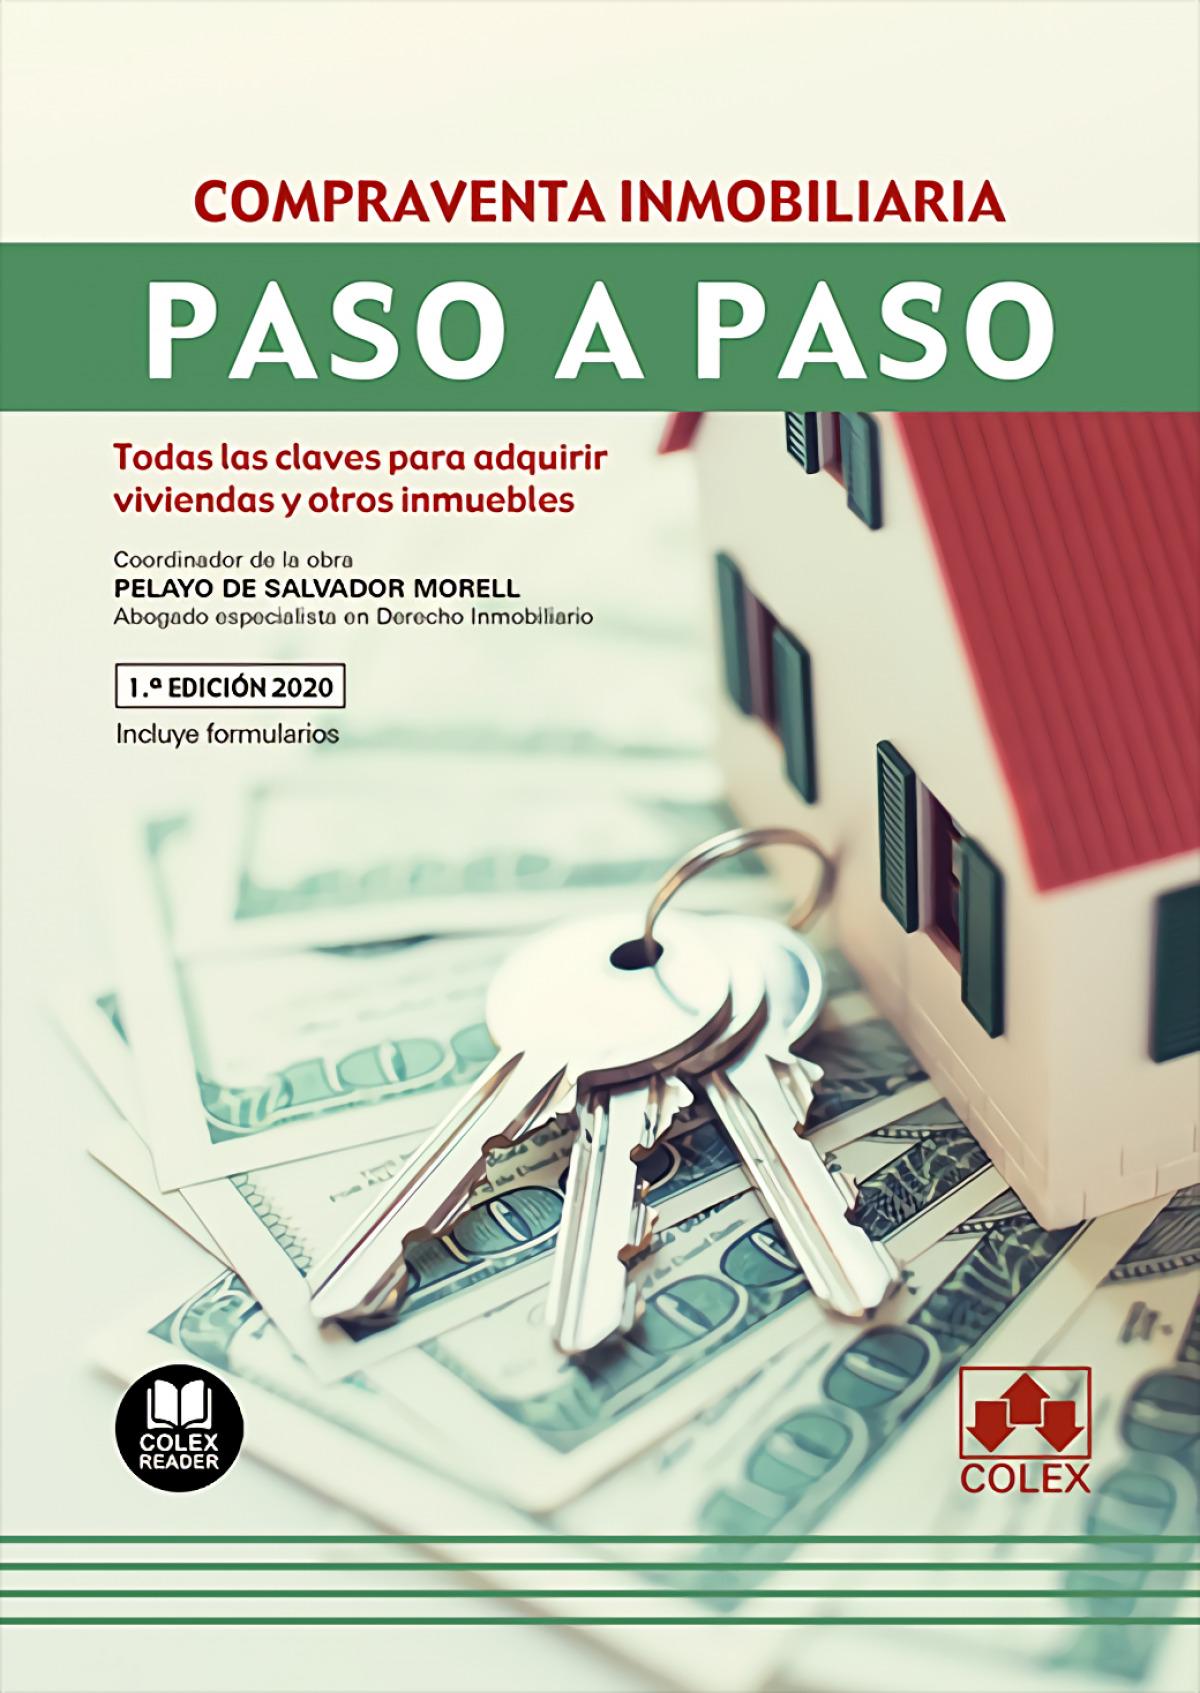 Compraventa inmobiliaria 9788413590387